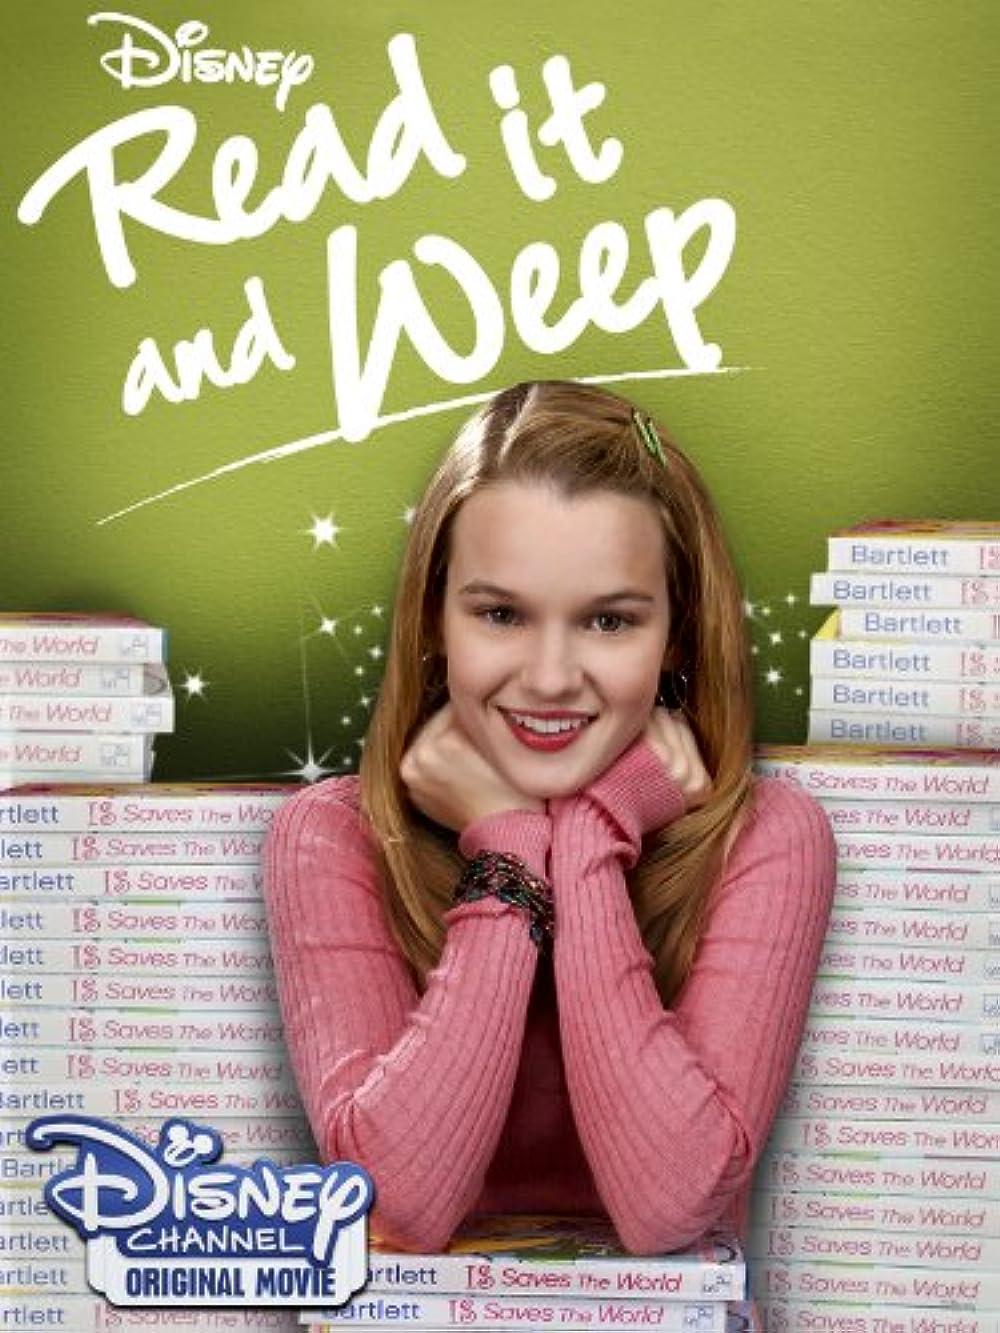 Read It and Weep (TV Movie 2006) - IMDb